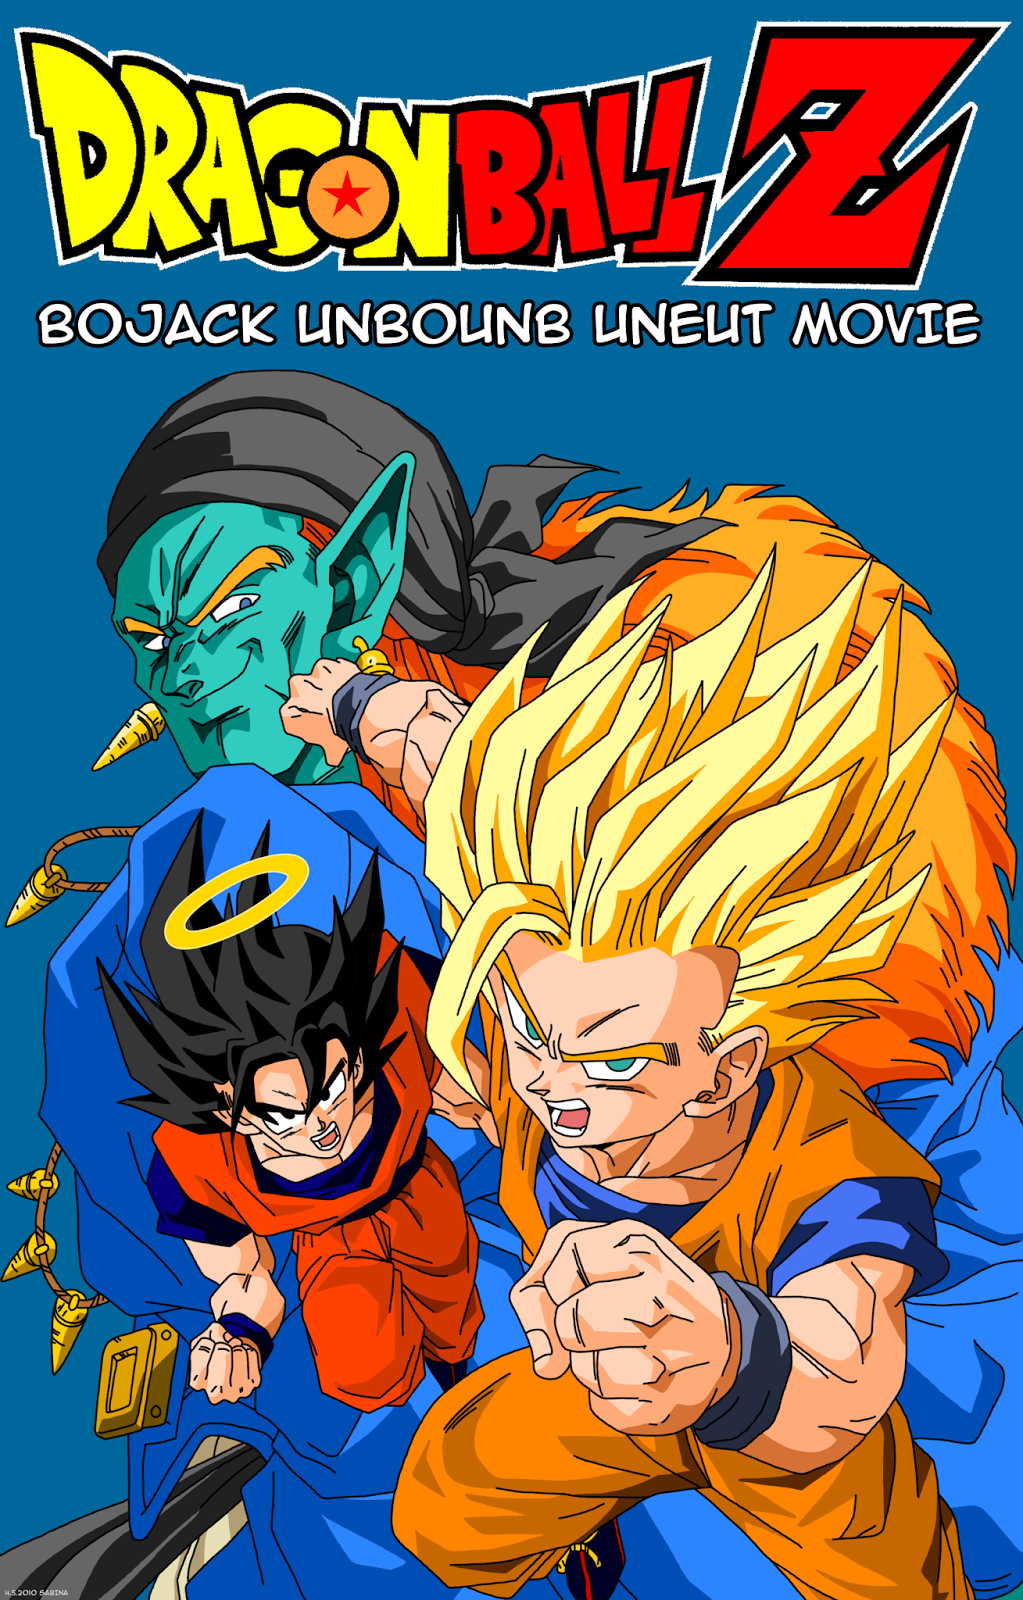 free download dragon ball z movies in hindi